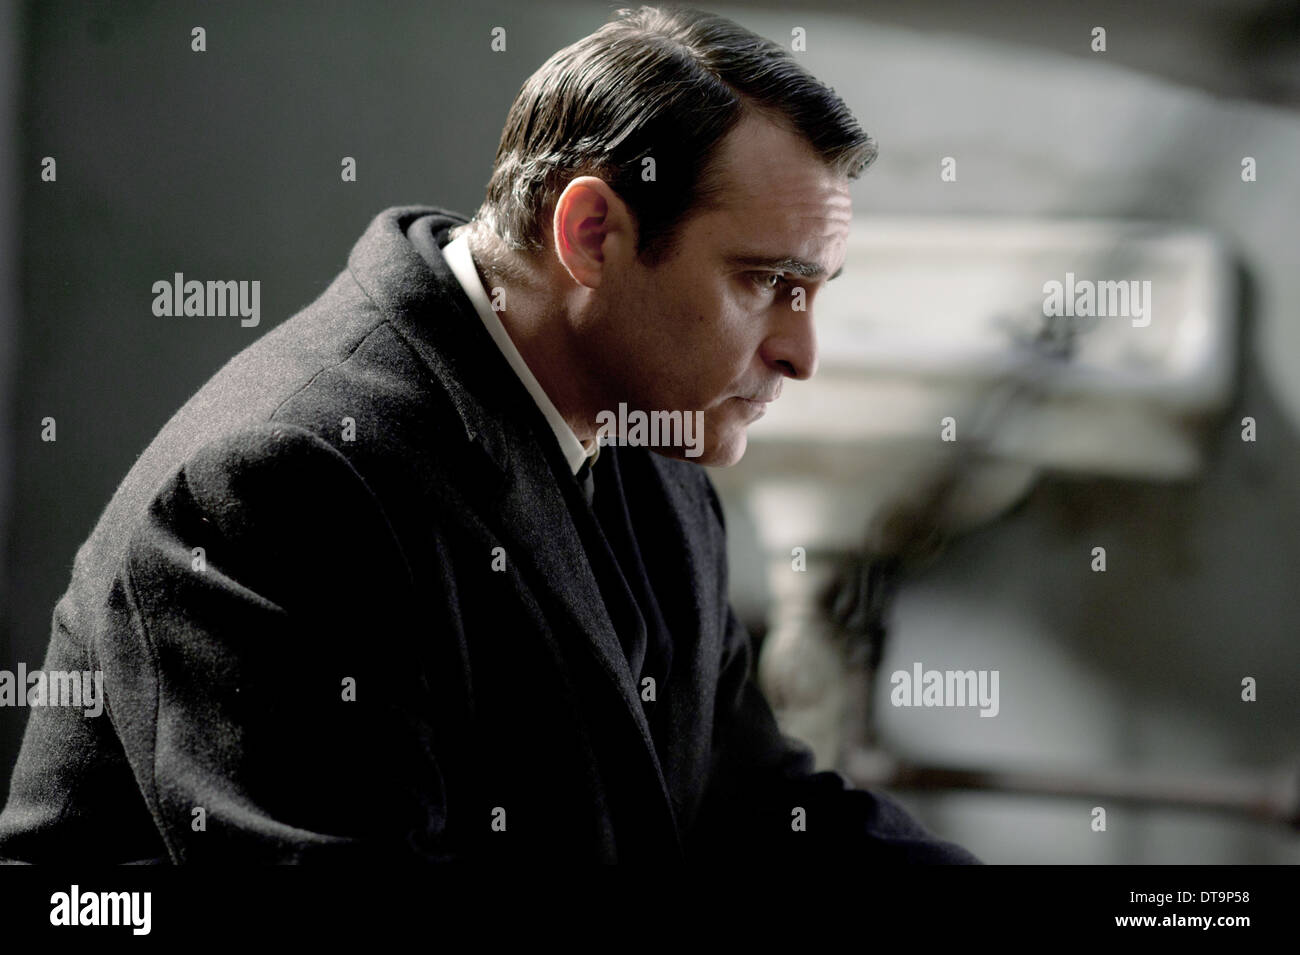 JOAQUIN PHOENIX THE IMMIGRANT (2013) - Stock Image